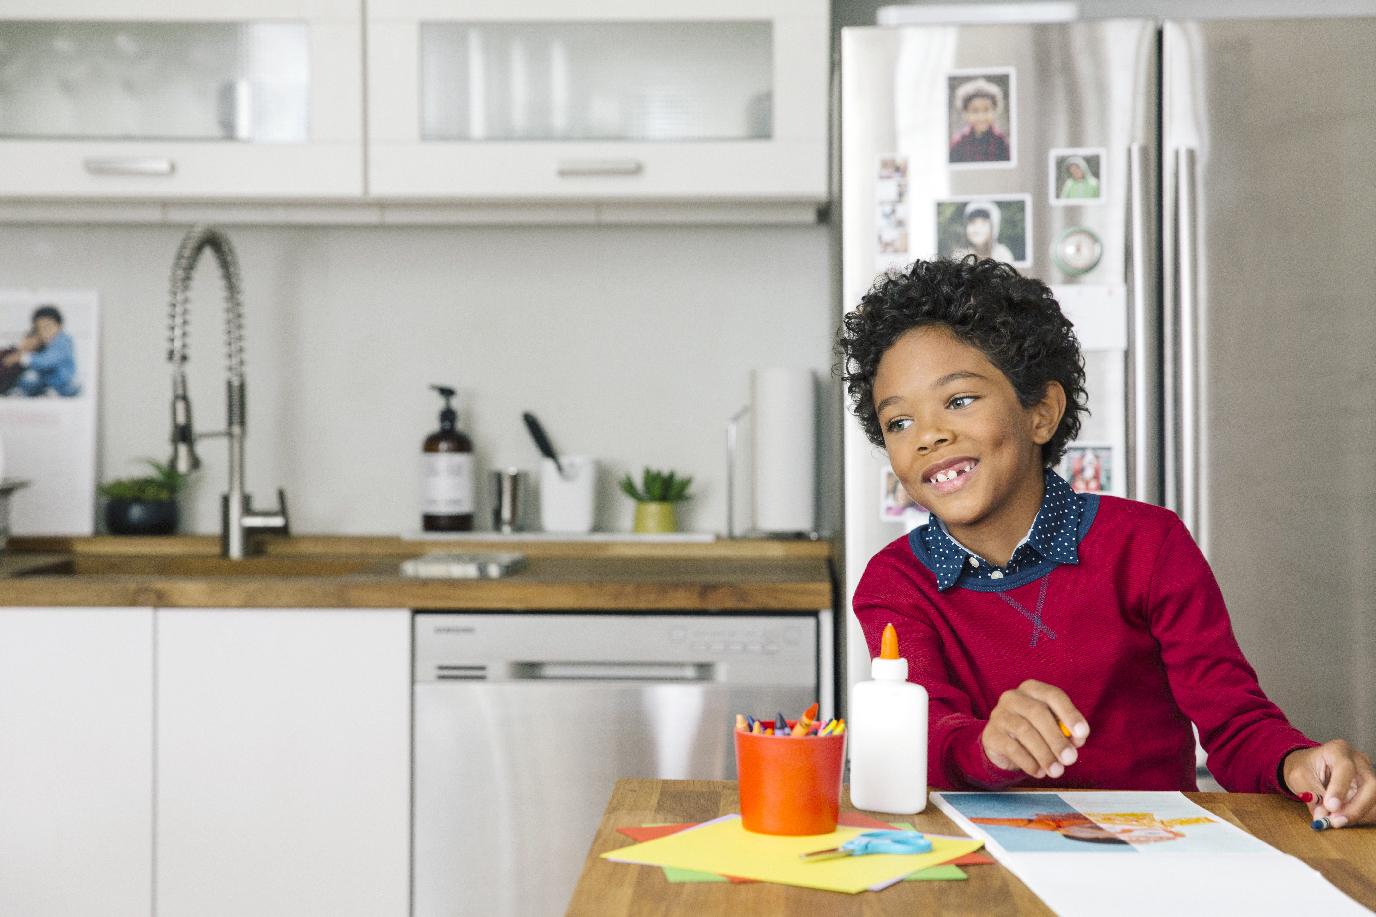 ricdesign-pinhole-K2016-kitchen.jpg